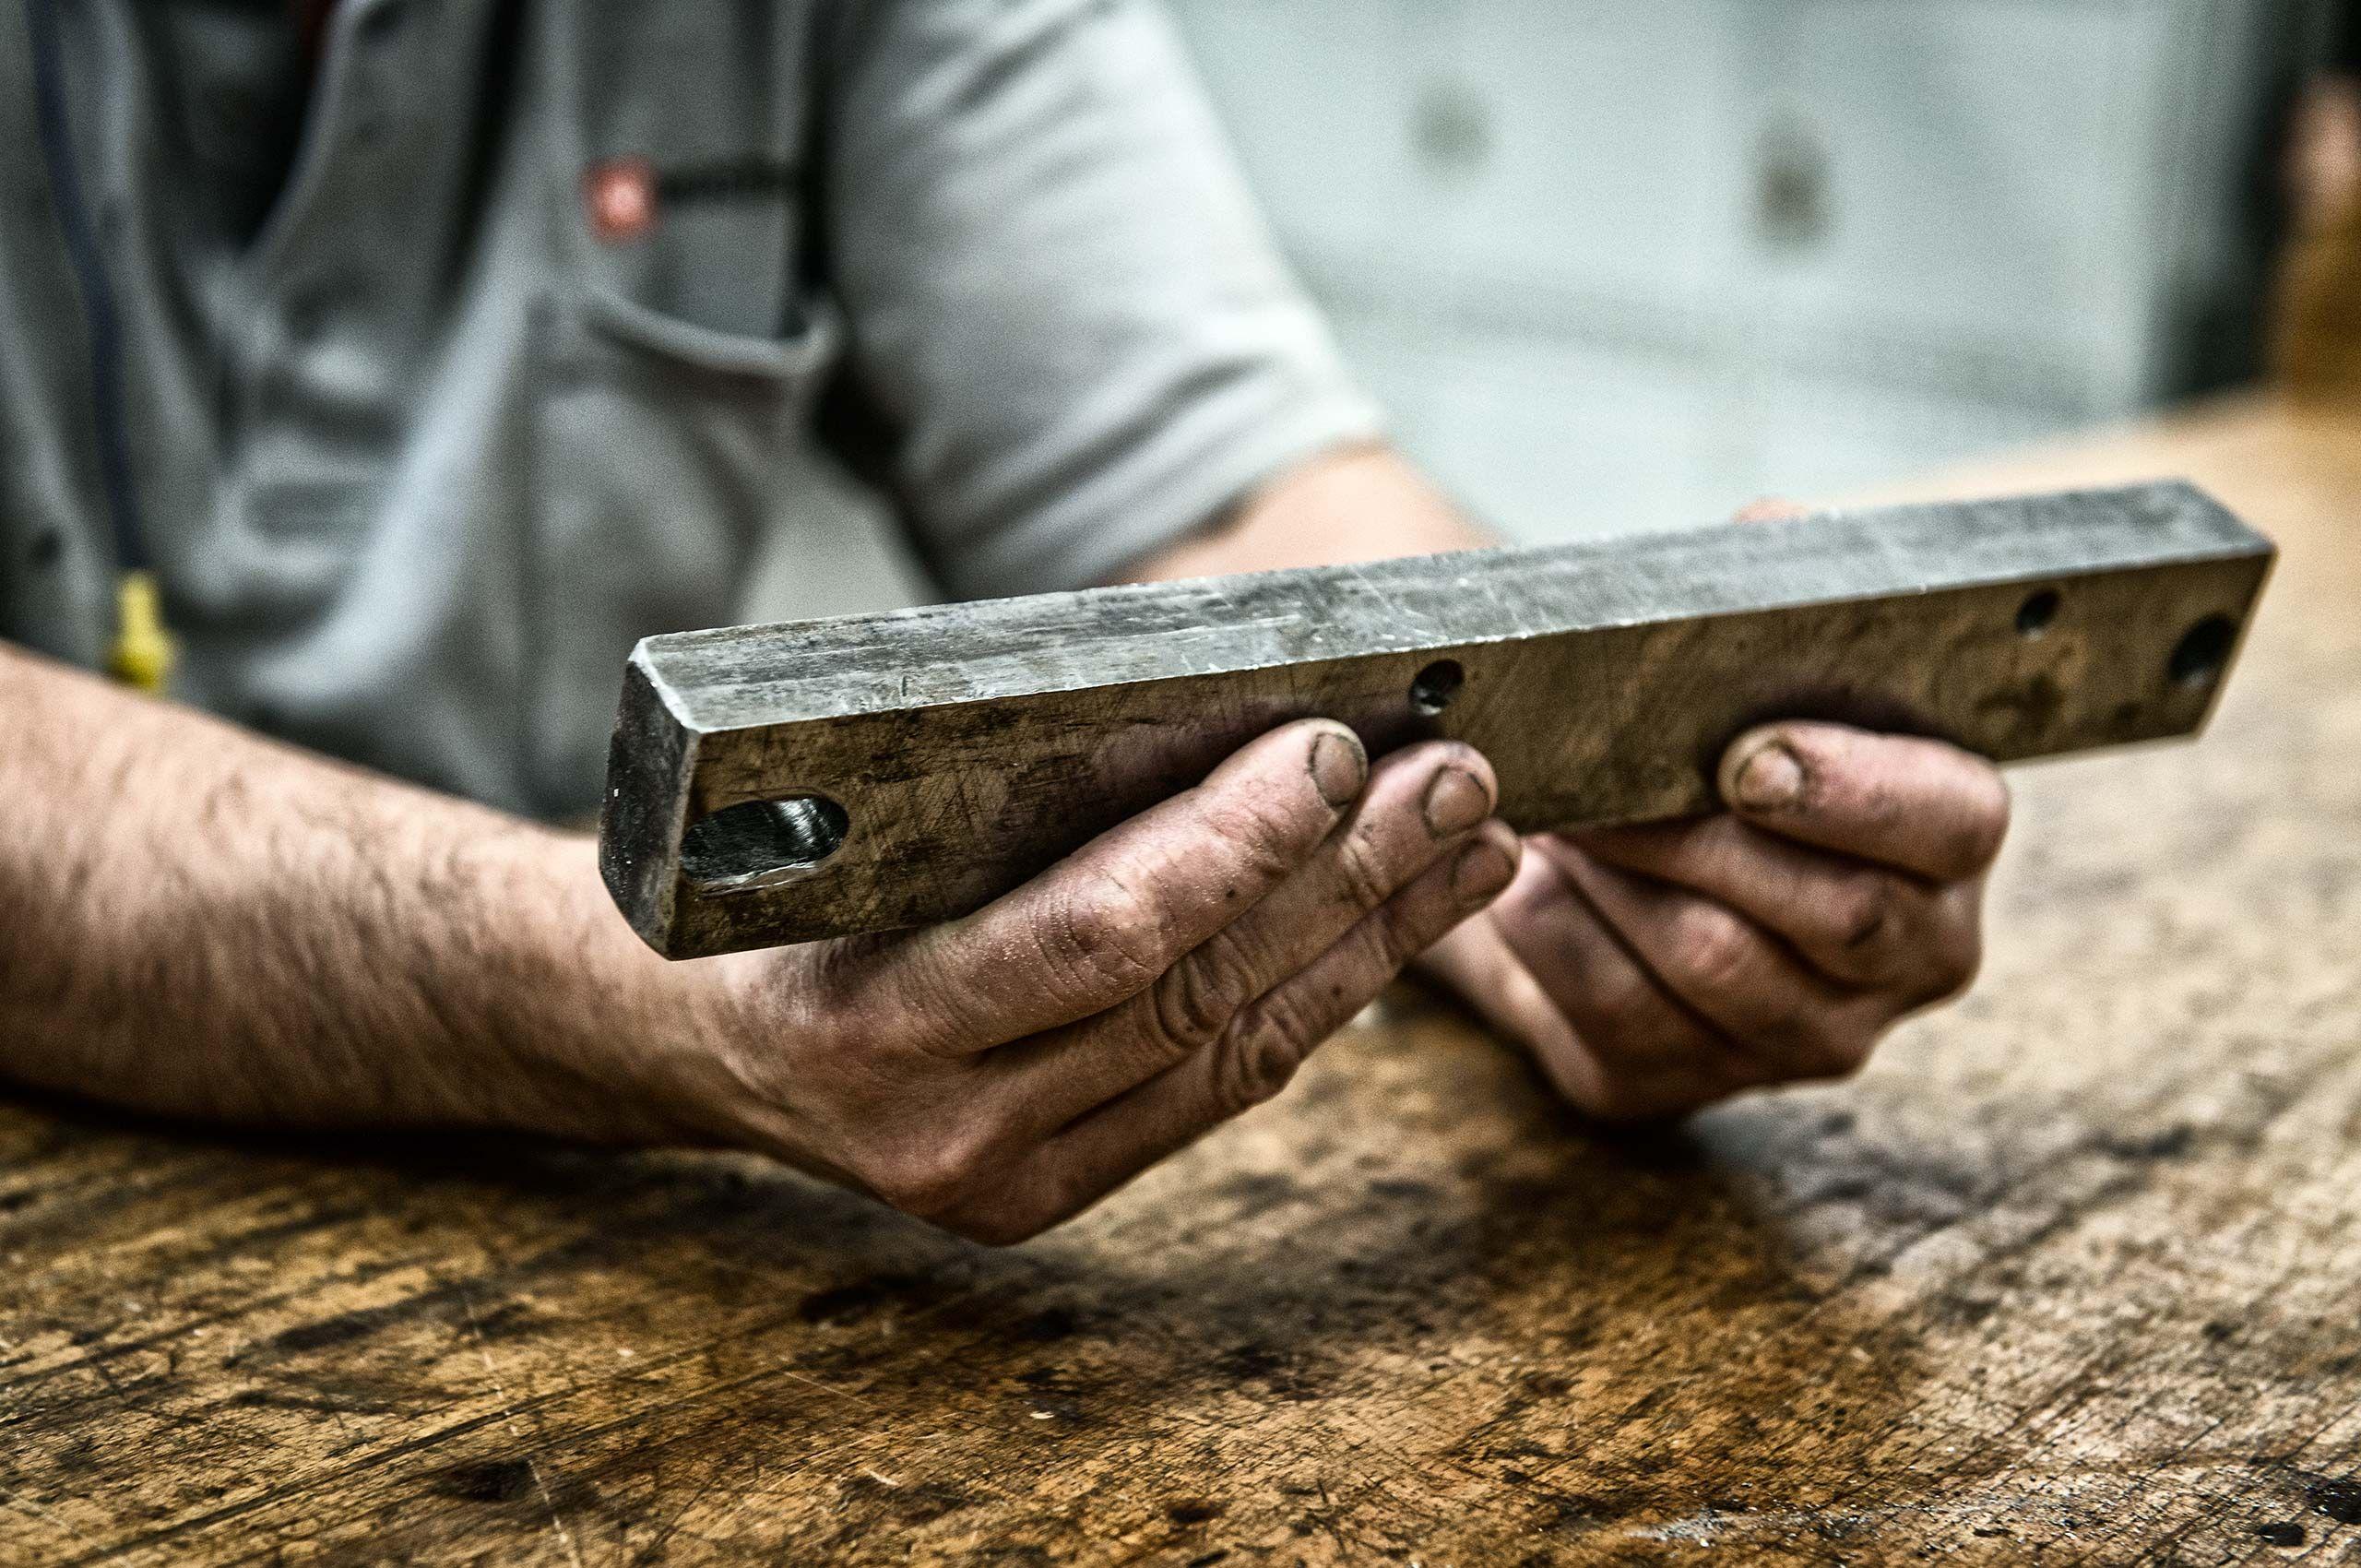 factory-hands-holding-metal-wusthof-factory-HenrikOlundPhotography.jpg